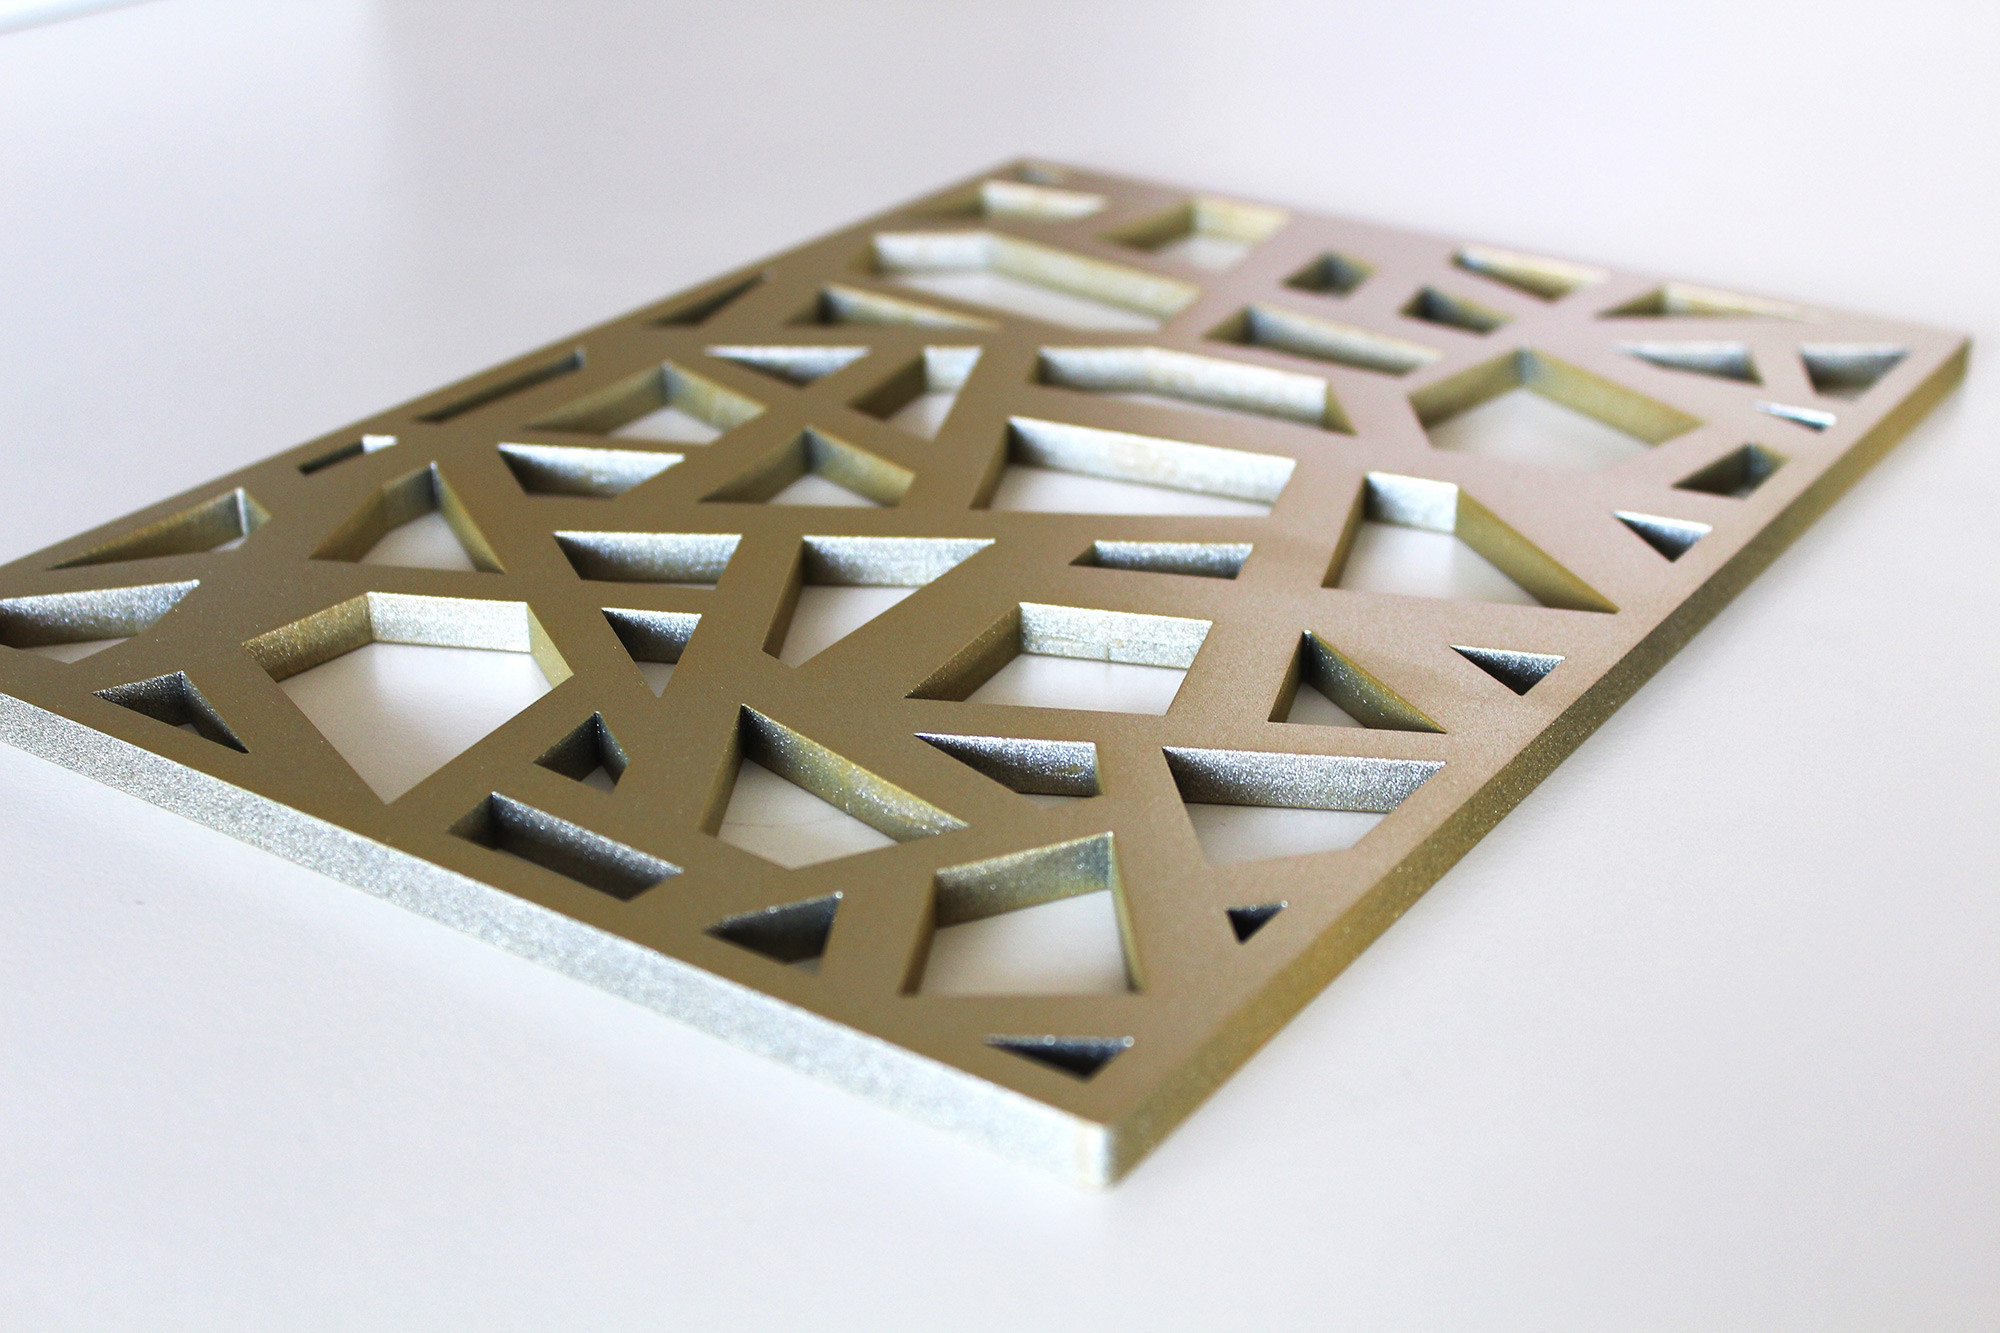 filigran perforierte fassadenplatten fassade news. Black Bedroom Furniture Sets. Home Design Ideas